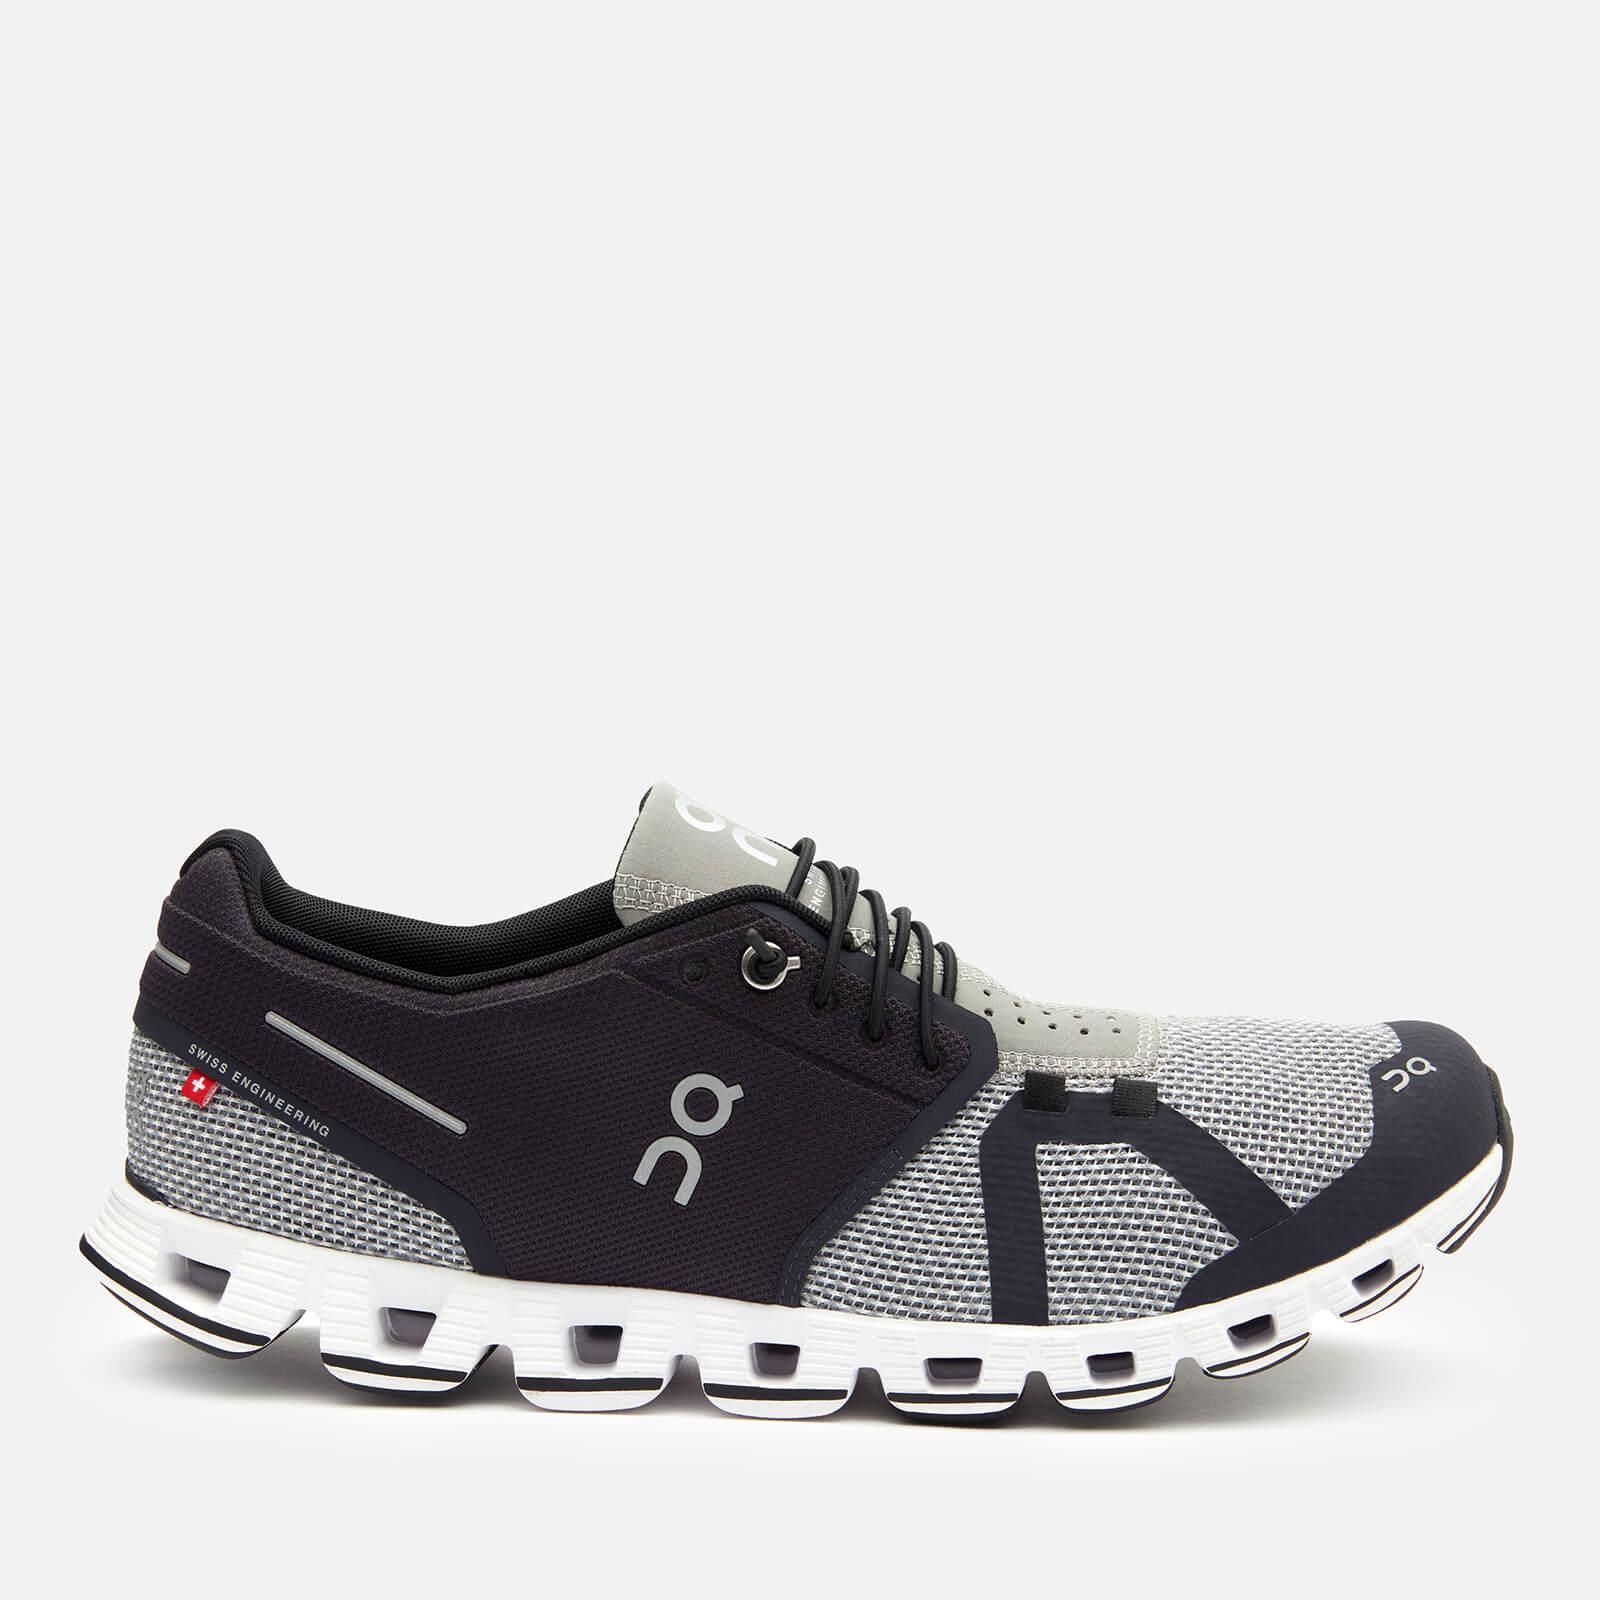 ON Men's Cloud Running Trainers - Black/Slate - UK 8